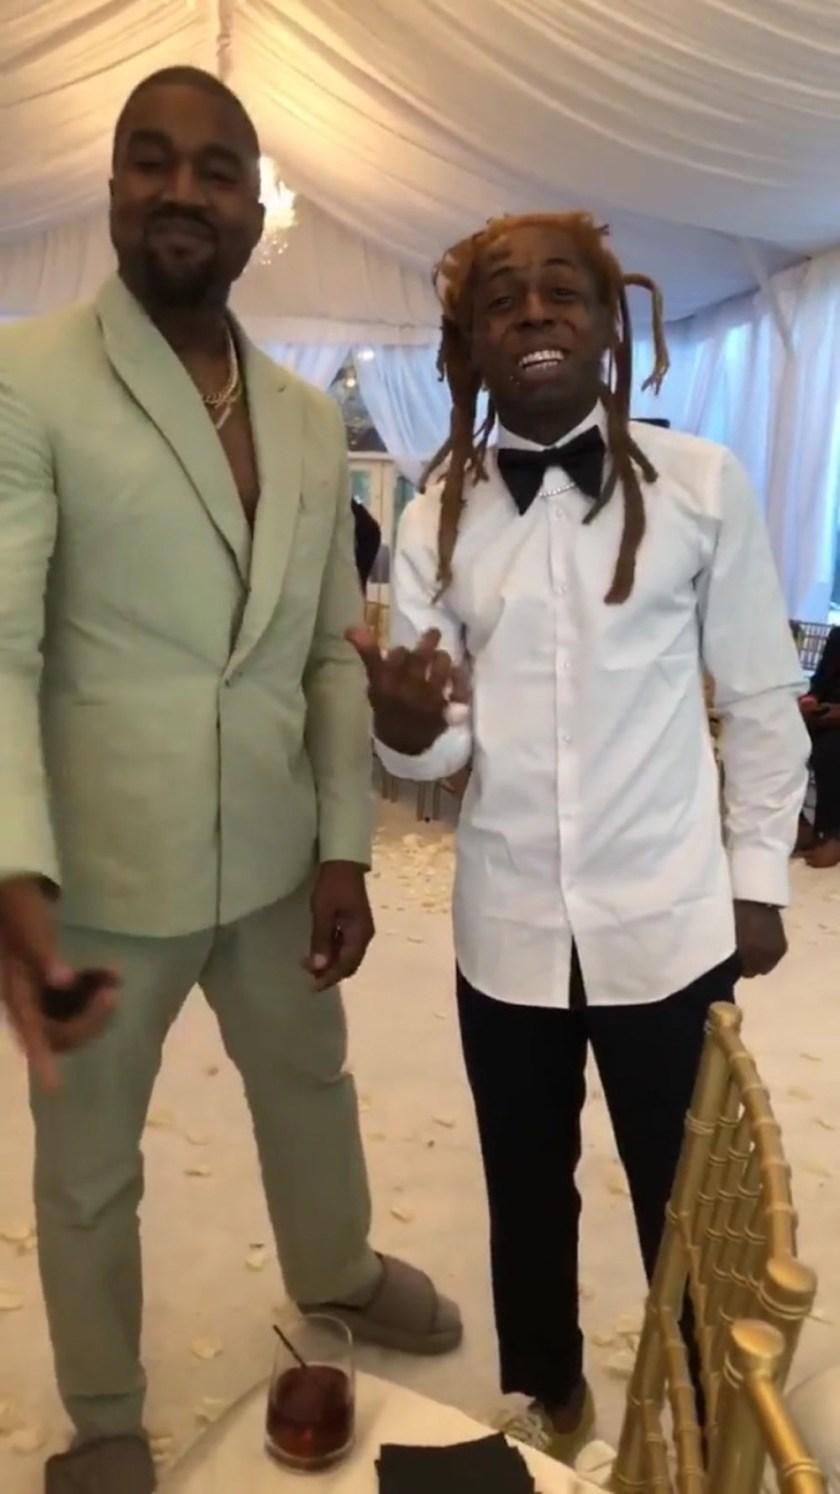 Rapper 2 Chainz marries his longtime girlfriend Kesha Ward in star-studded Miami wedding (Photos)